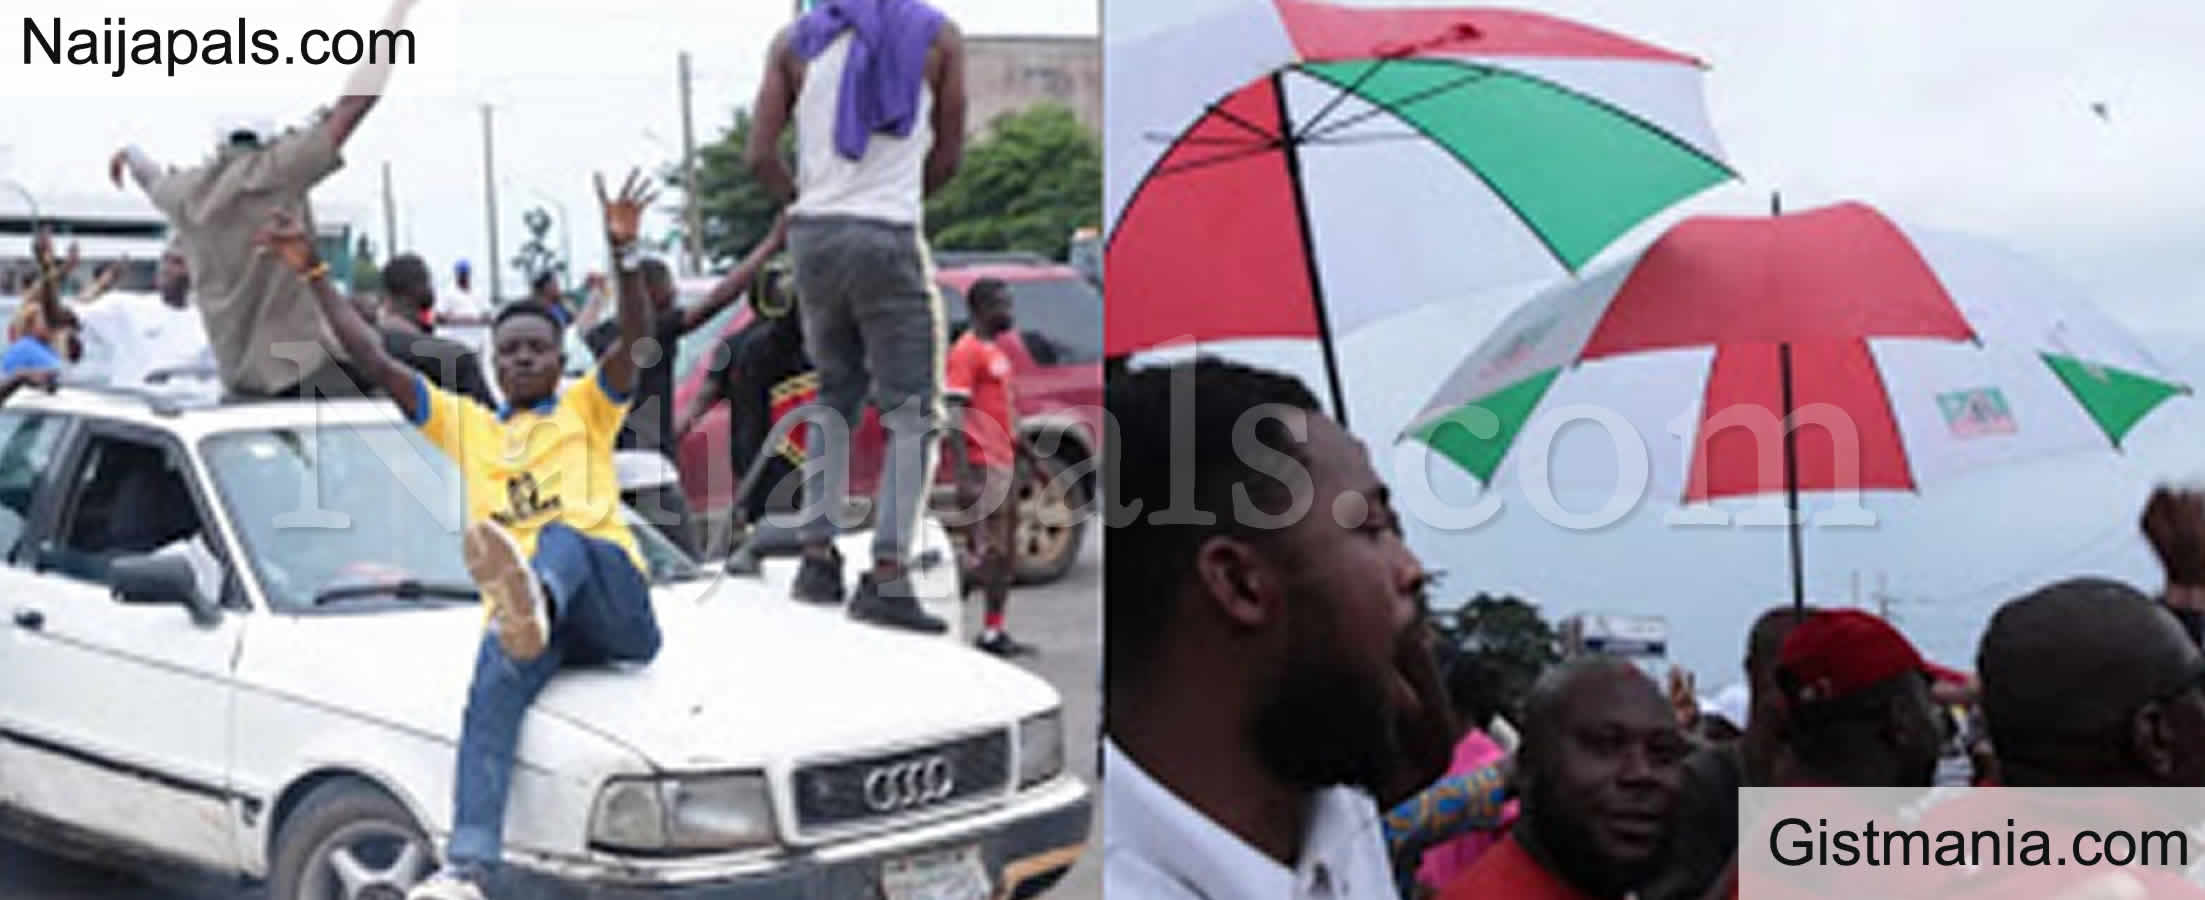 <img alt='.' class='lazyload' data-src='https://img.gistmania.com/emot/photo.png' /><img alt='.' class='lazyload' data-src='https://img.gistmania.com/emot/comment.gif' /> EDO ELECTION: <b>Youth & Party Supporters Burst Into Wild Celebration Over Obaseki's Victory</b>